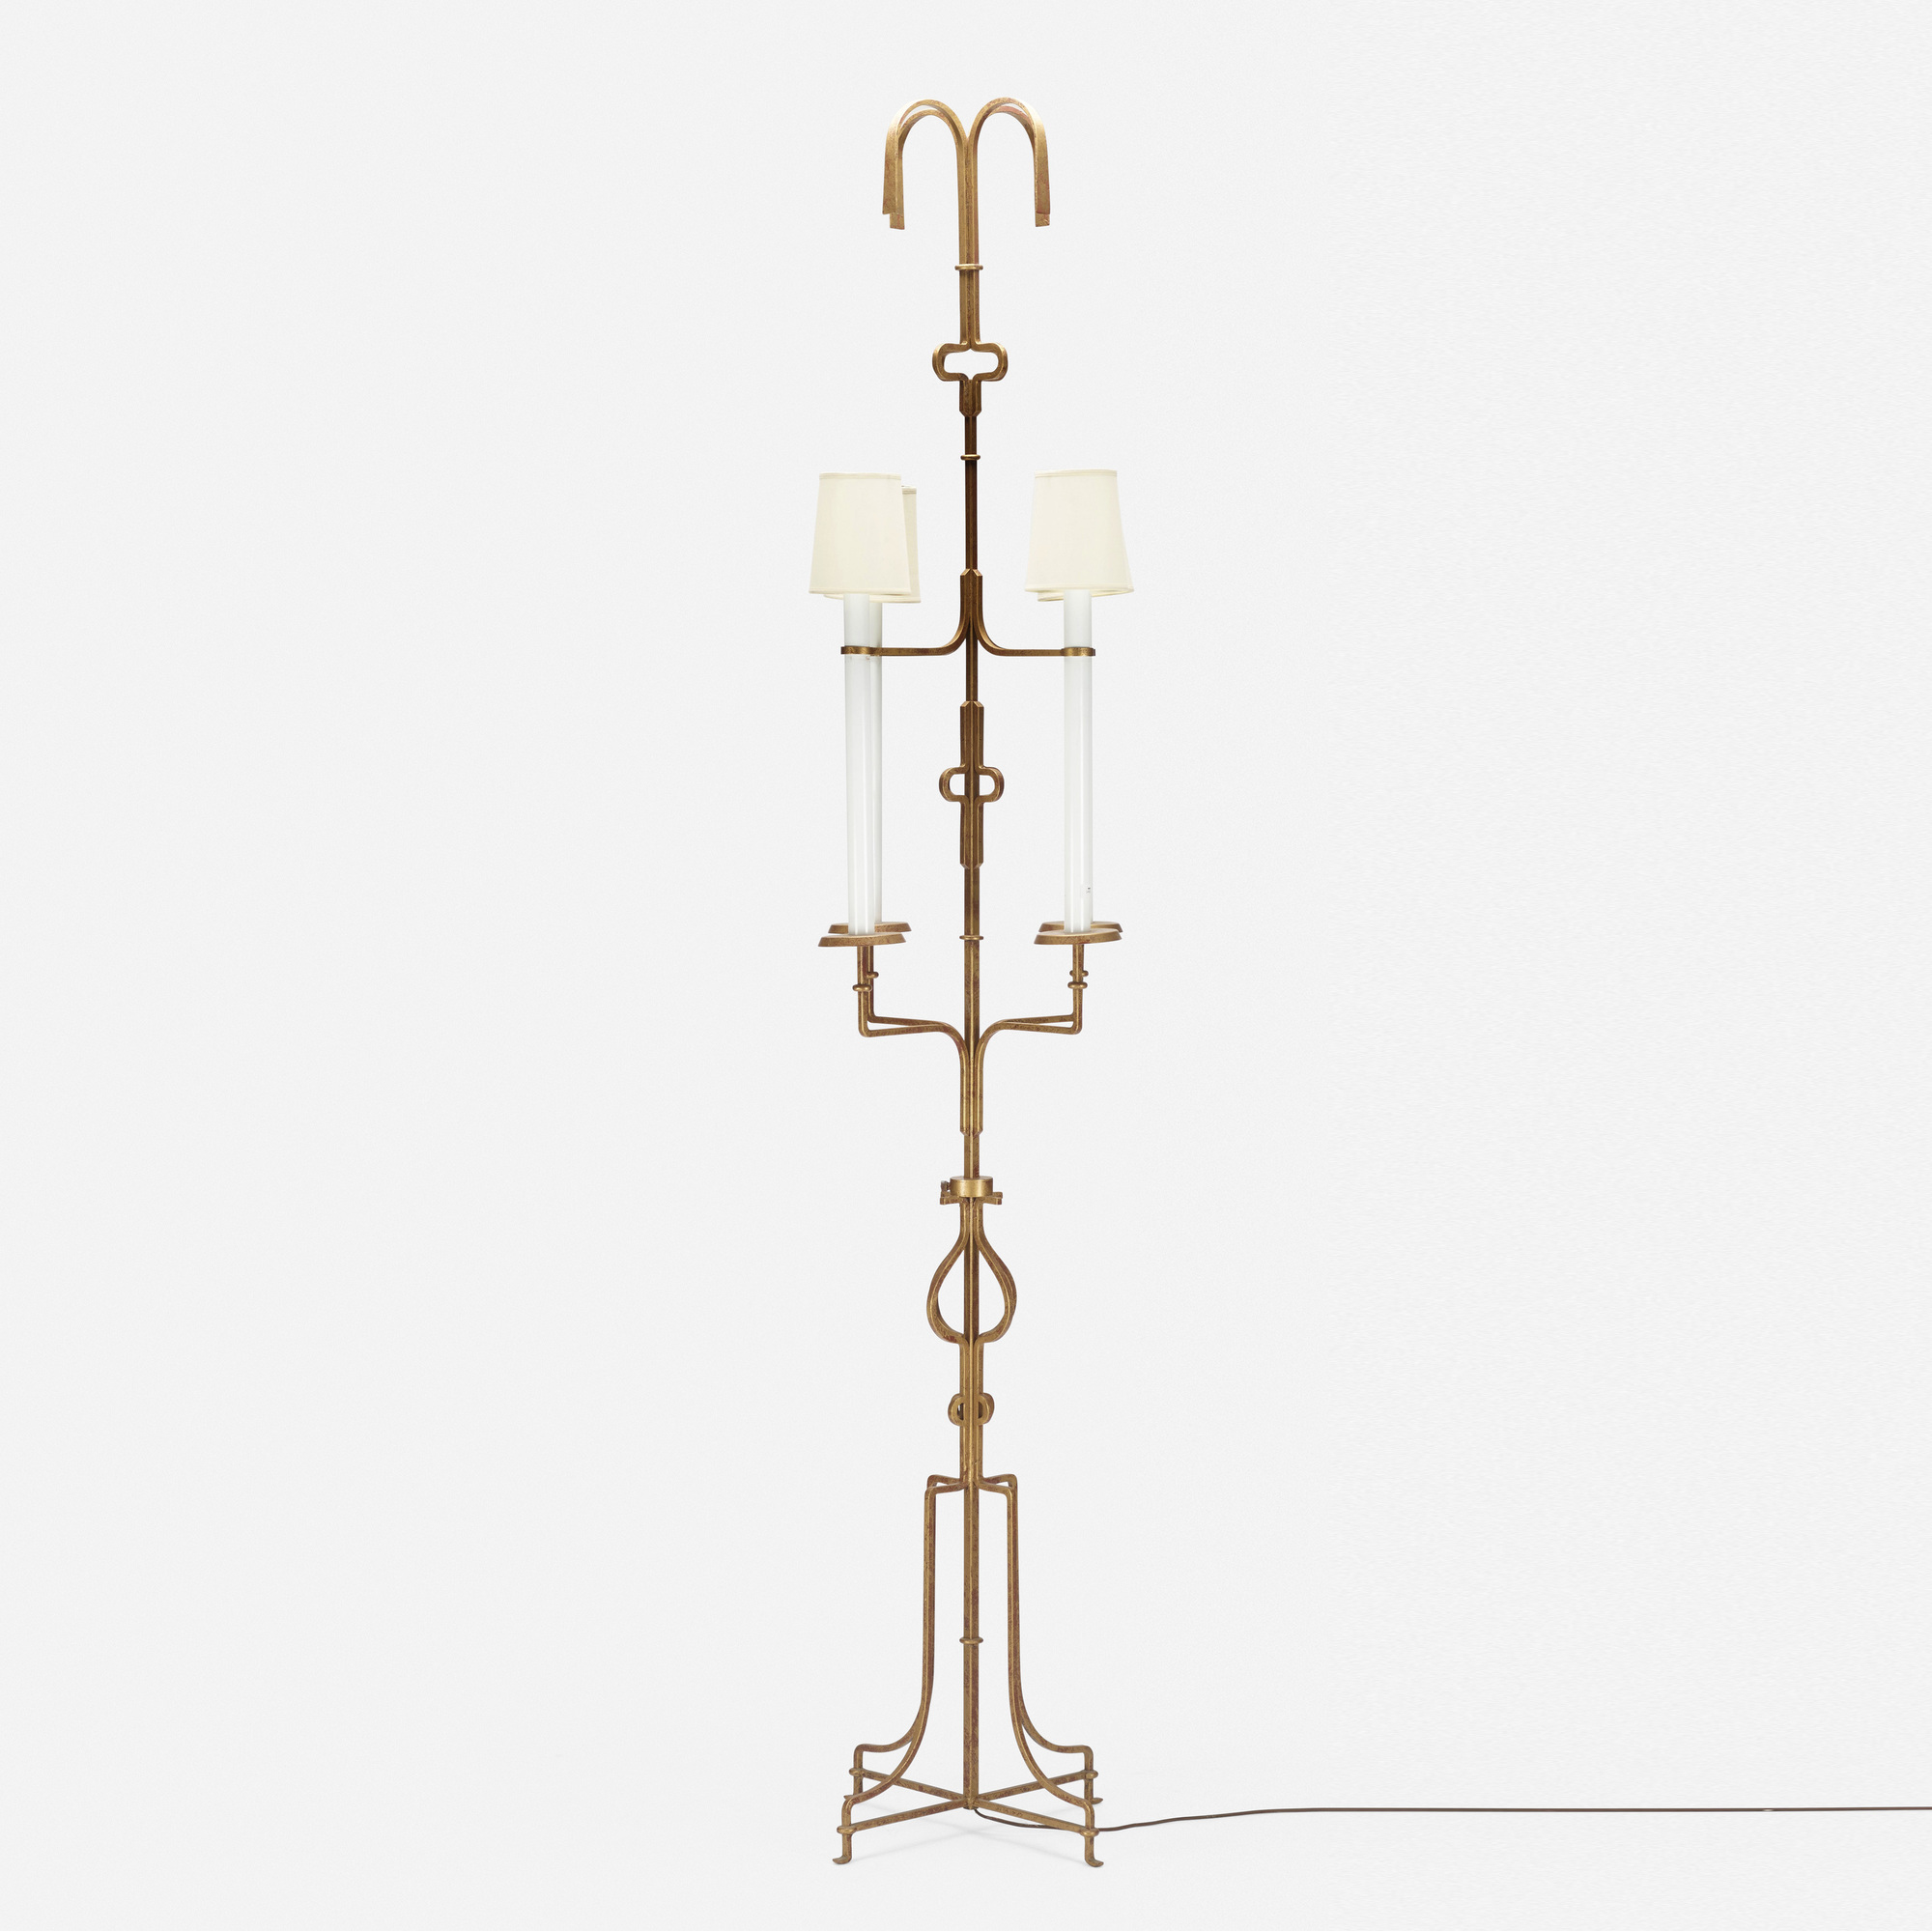 132: Tommi Parzinger / floor lamp (2 of 2)